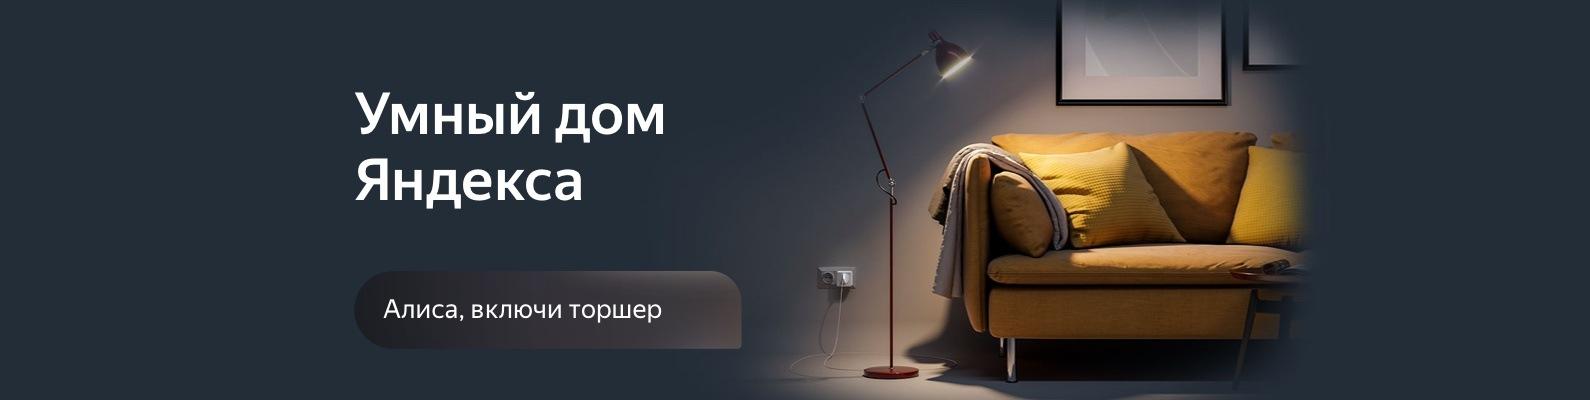 Яндекс онлайн порно с монстрами будущего